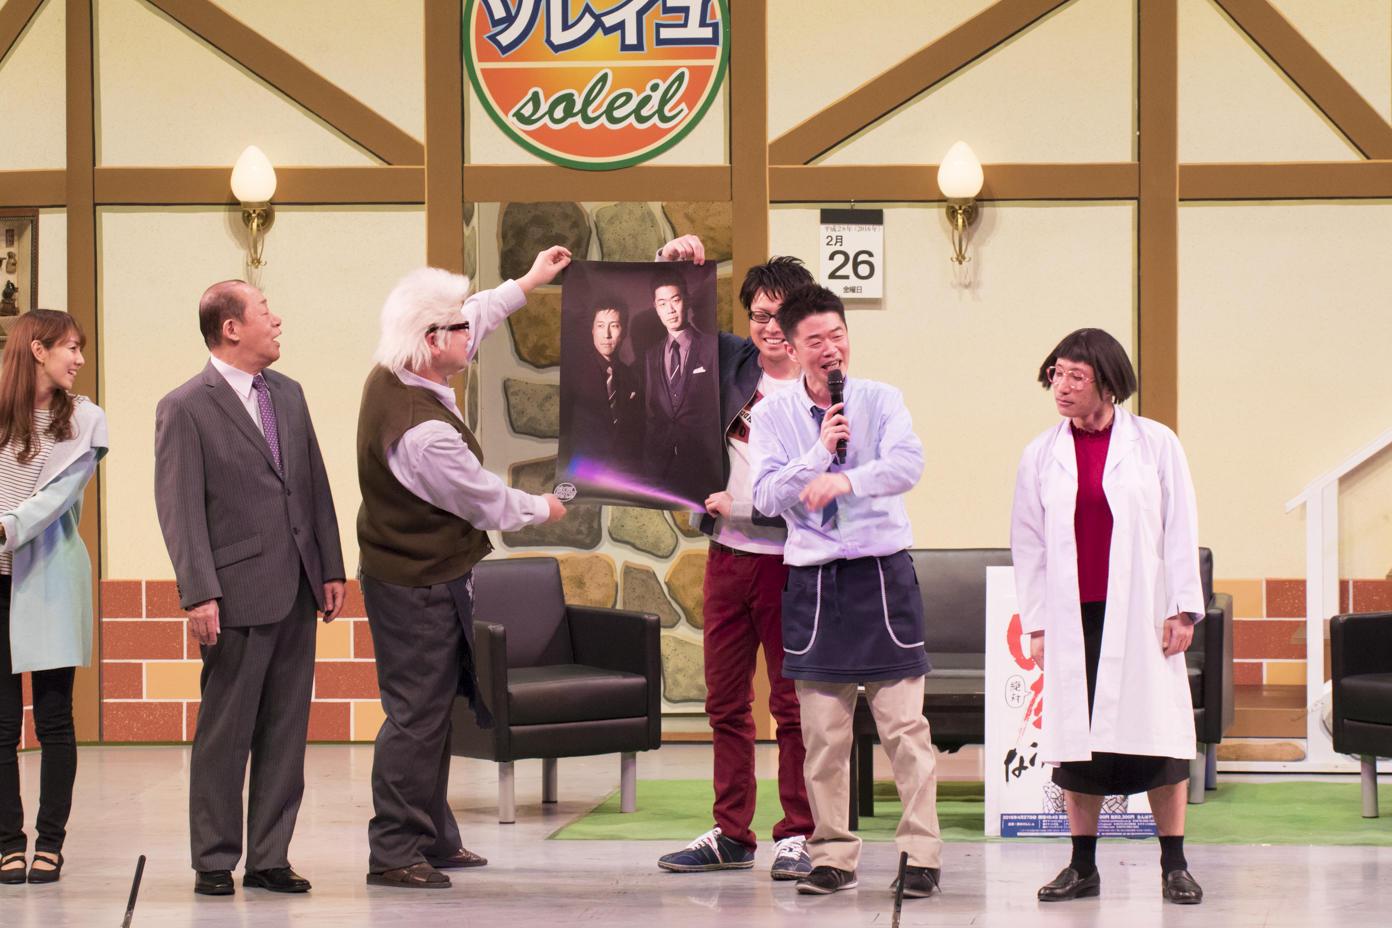 http://news.yoshimoto.co.jp/20160228174843-f73534dfc871401e424141433dd61e56eacb0e05.jpg